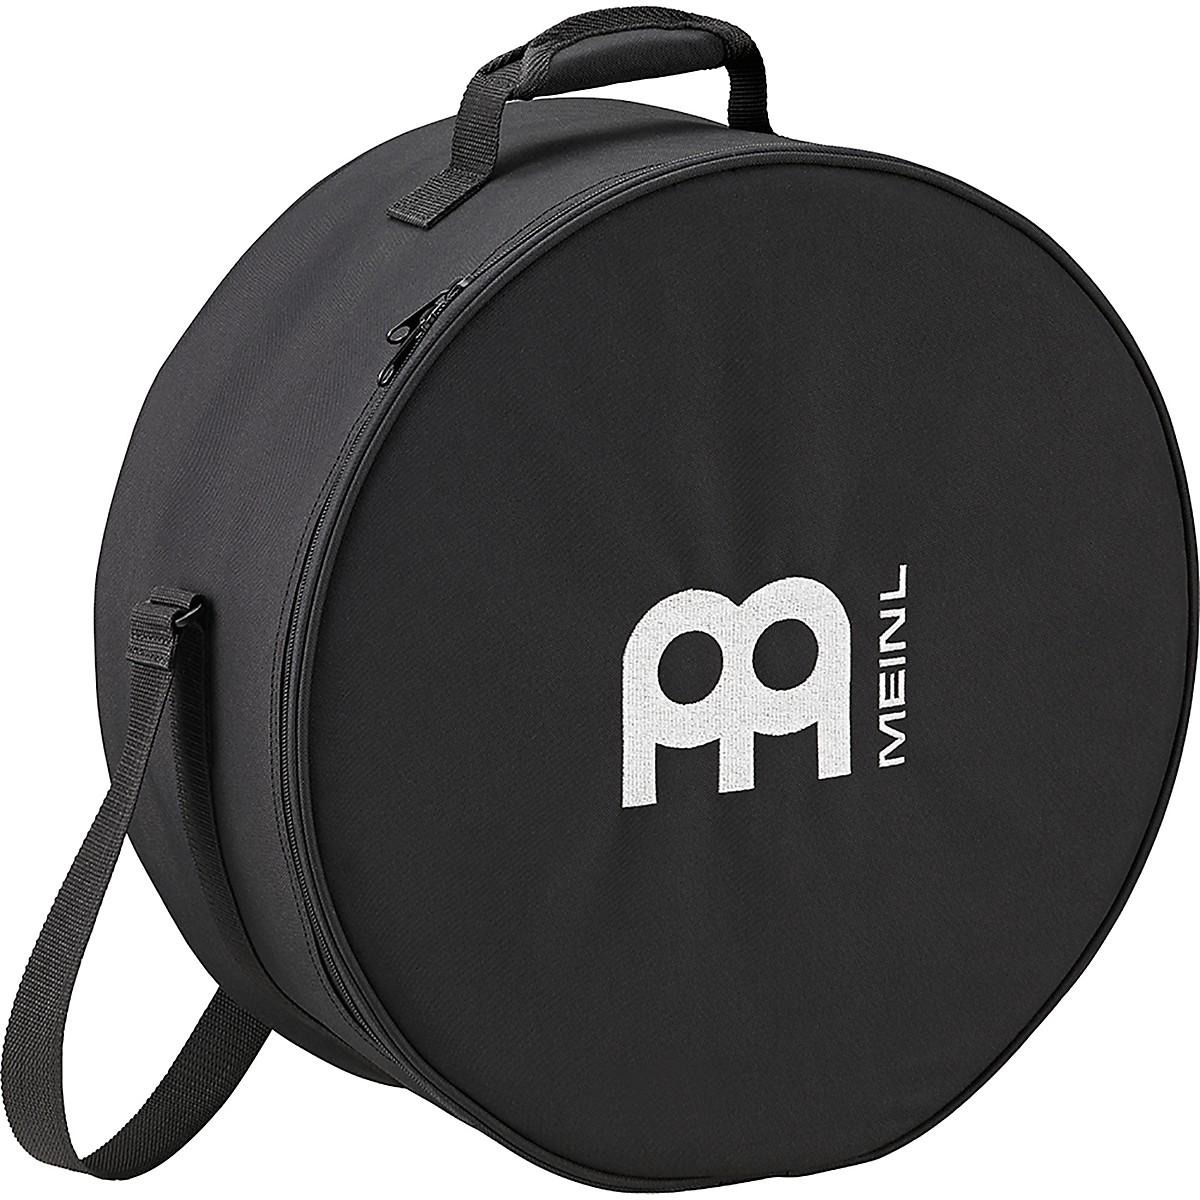 Meinl Professional Bodhran Bag